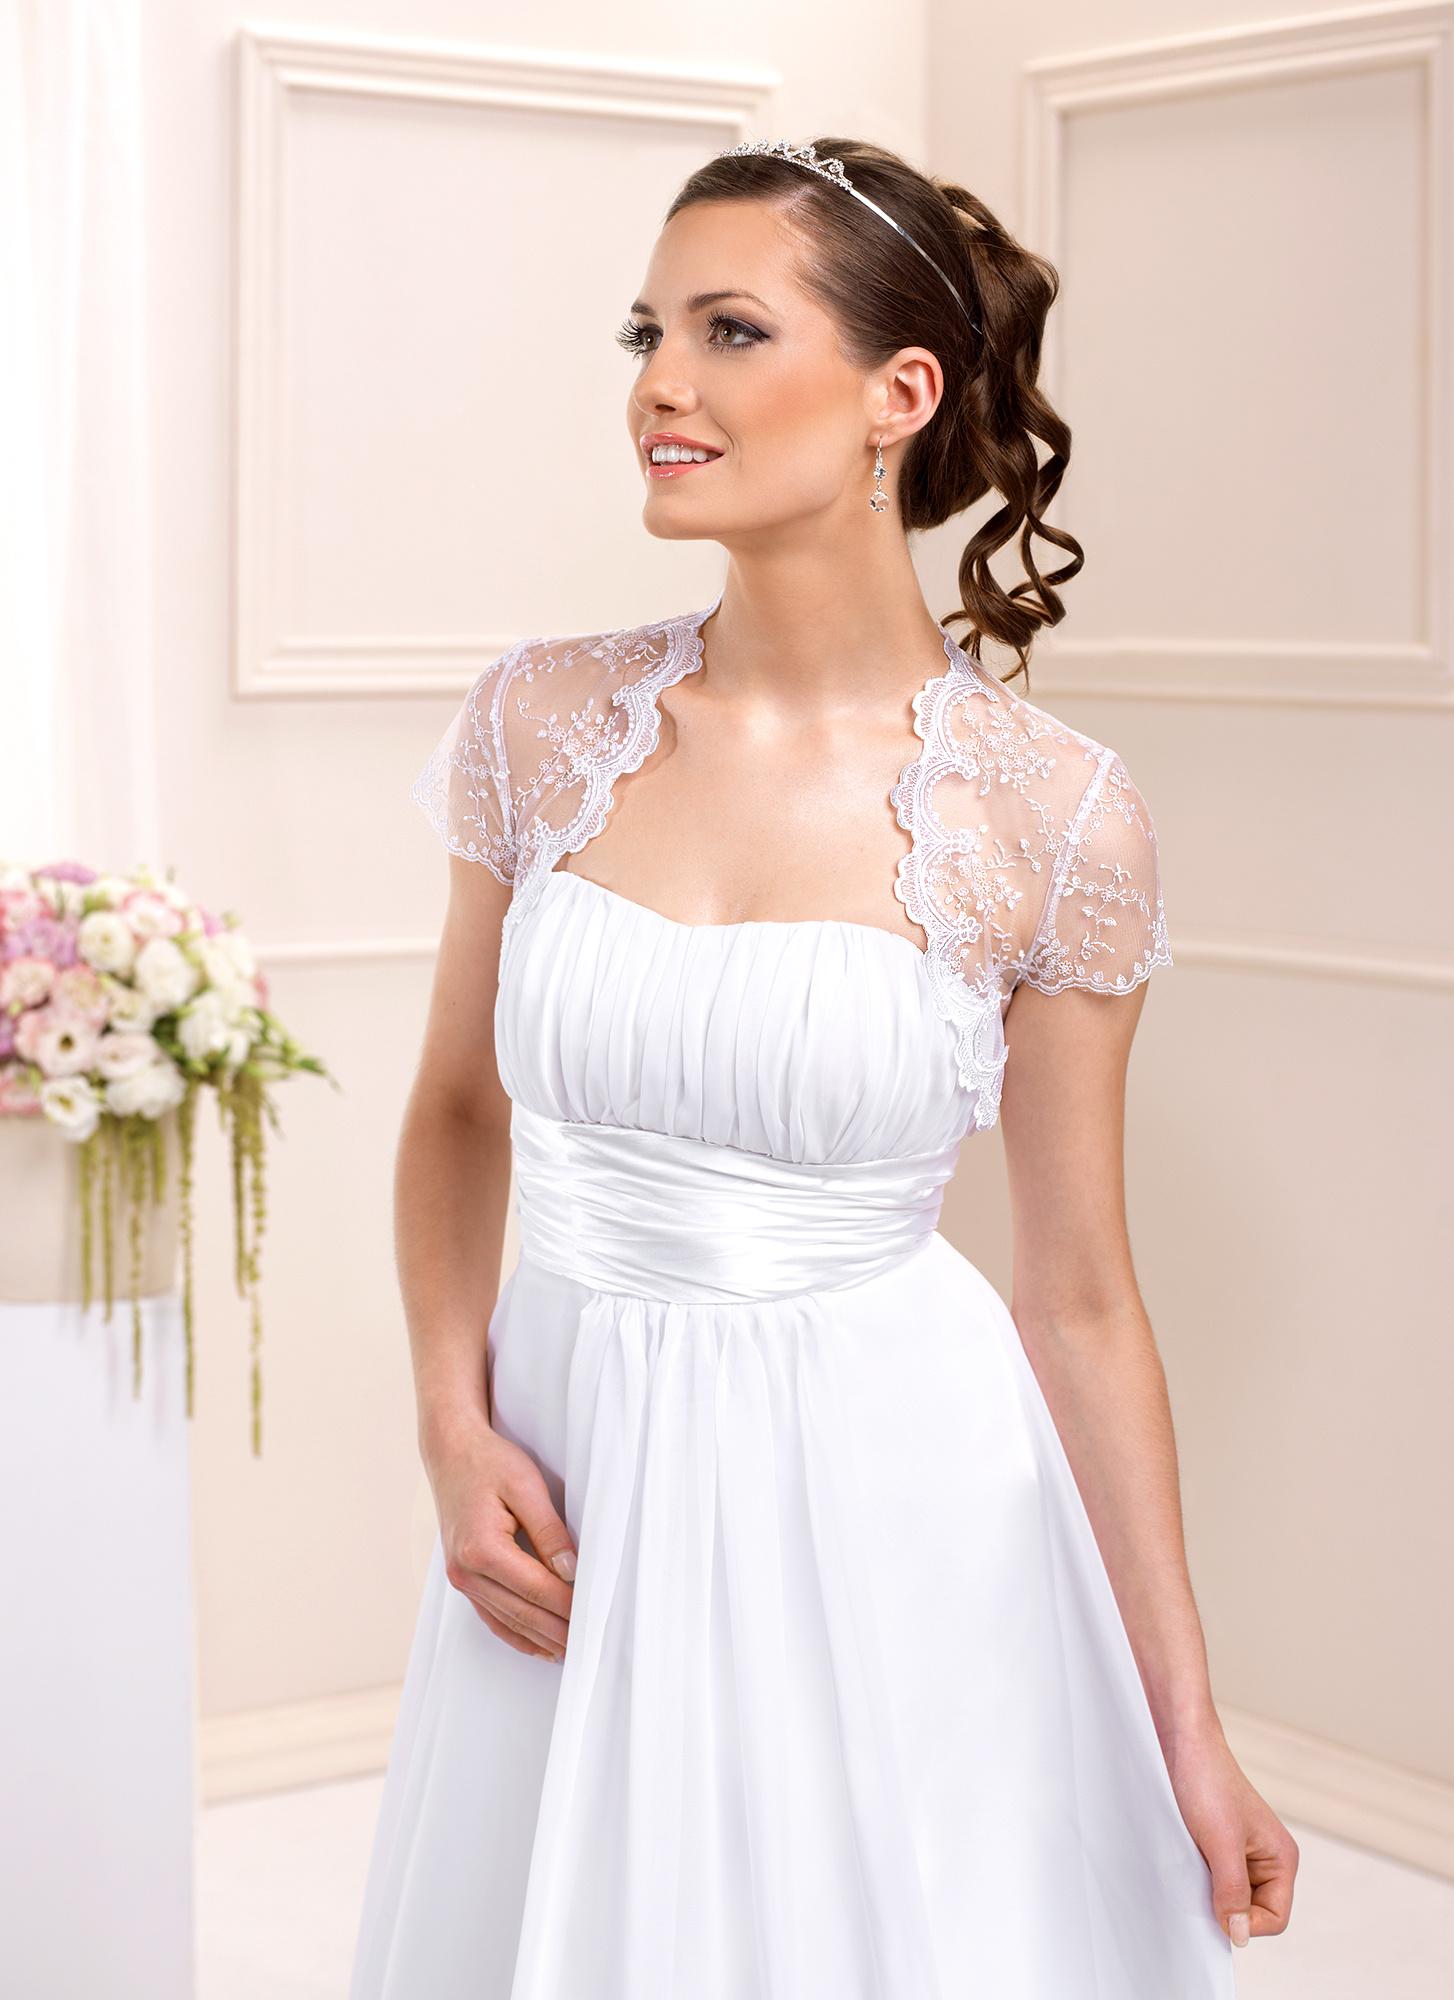 Spitzenbolero zum Brautkleid kurzarm